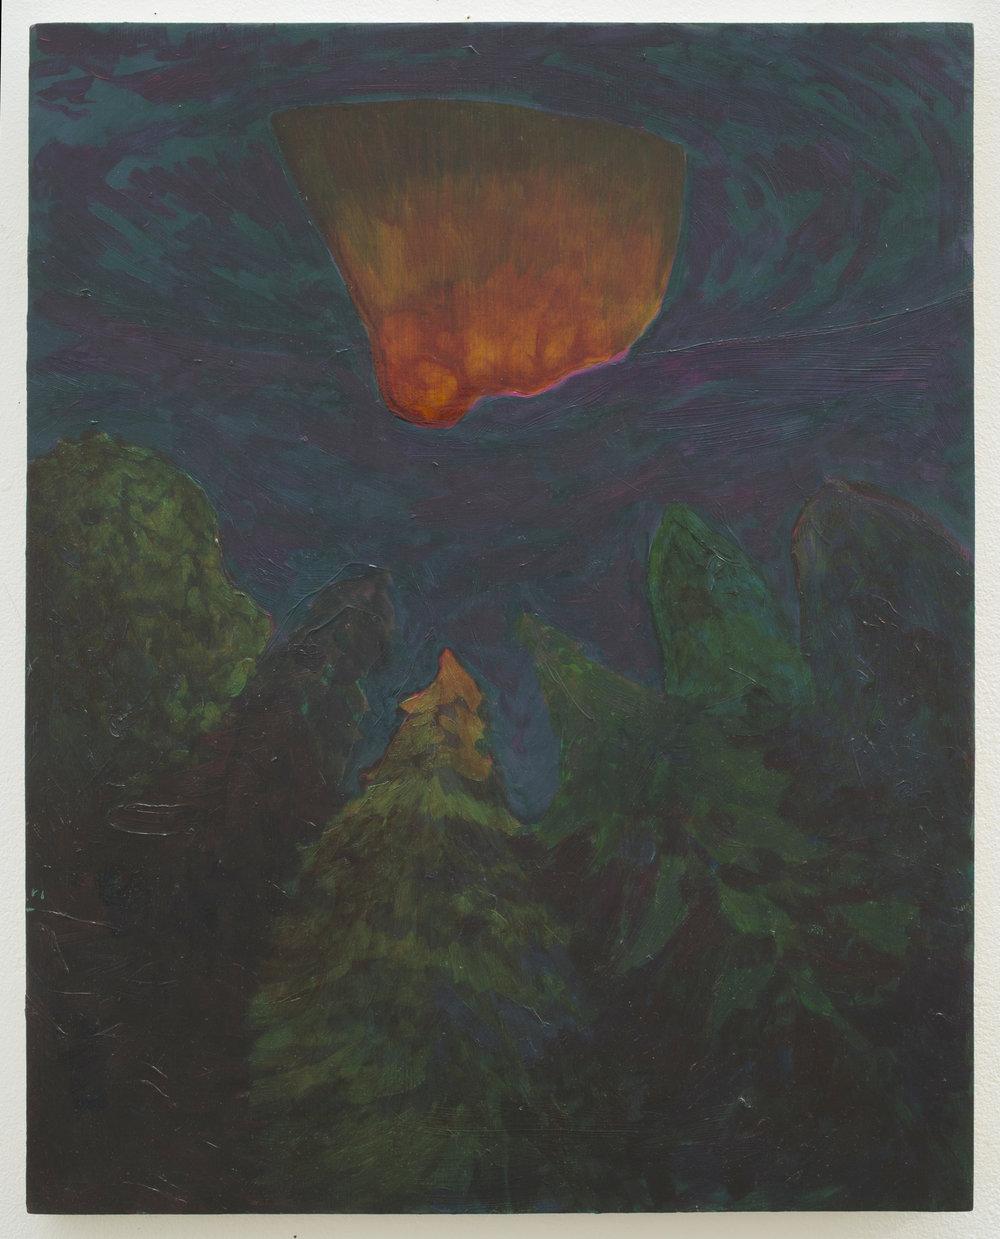 Alex Jackson rri al, 2015 oil on panel 18h x 14w in